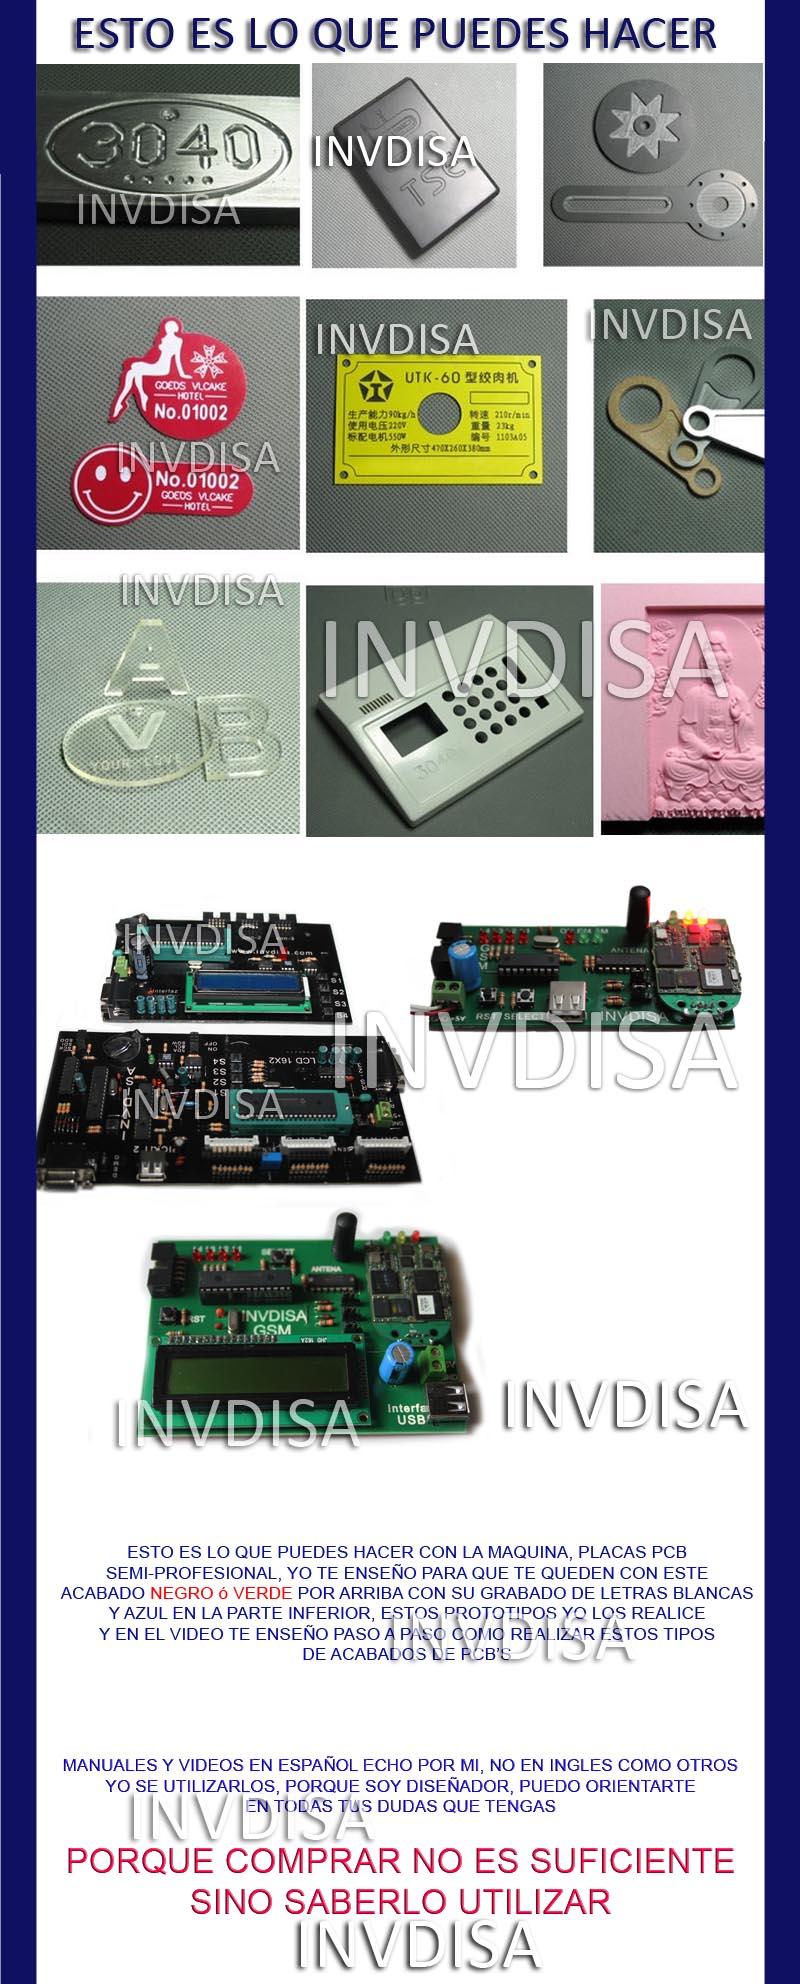 http://www.invdisa.com/ML/CCNC3040C02